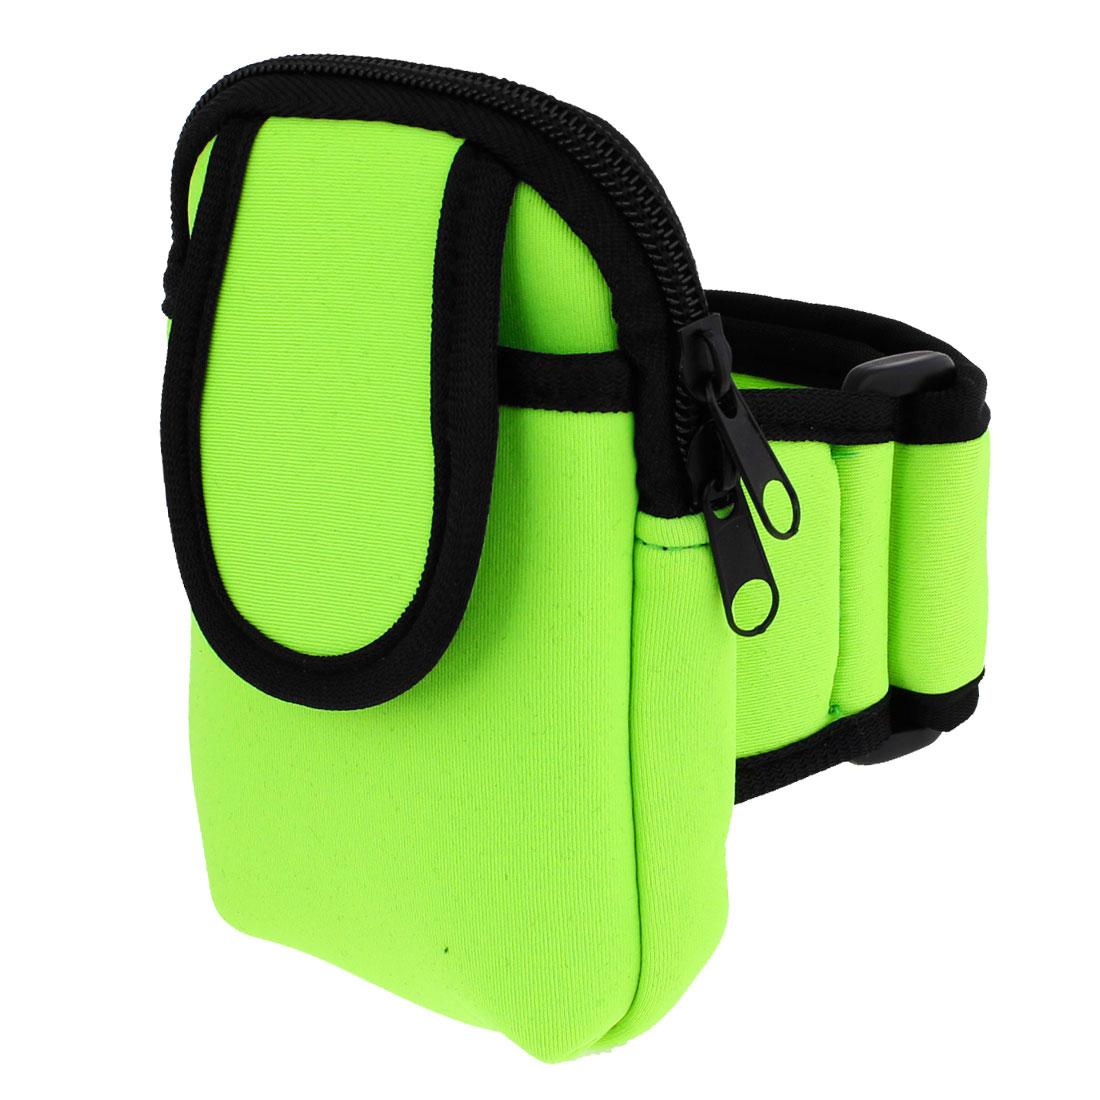 Protable Black Rim Smartphone Holder Arm Bag Protector Green